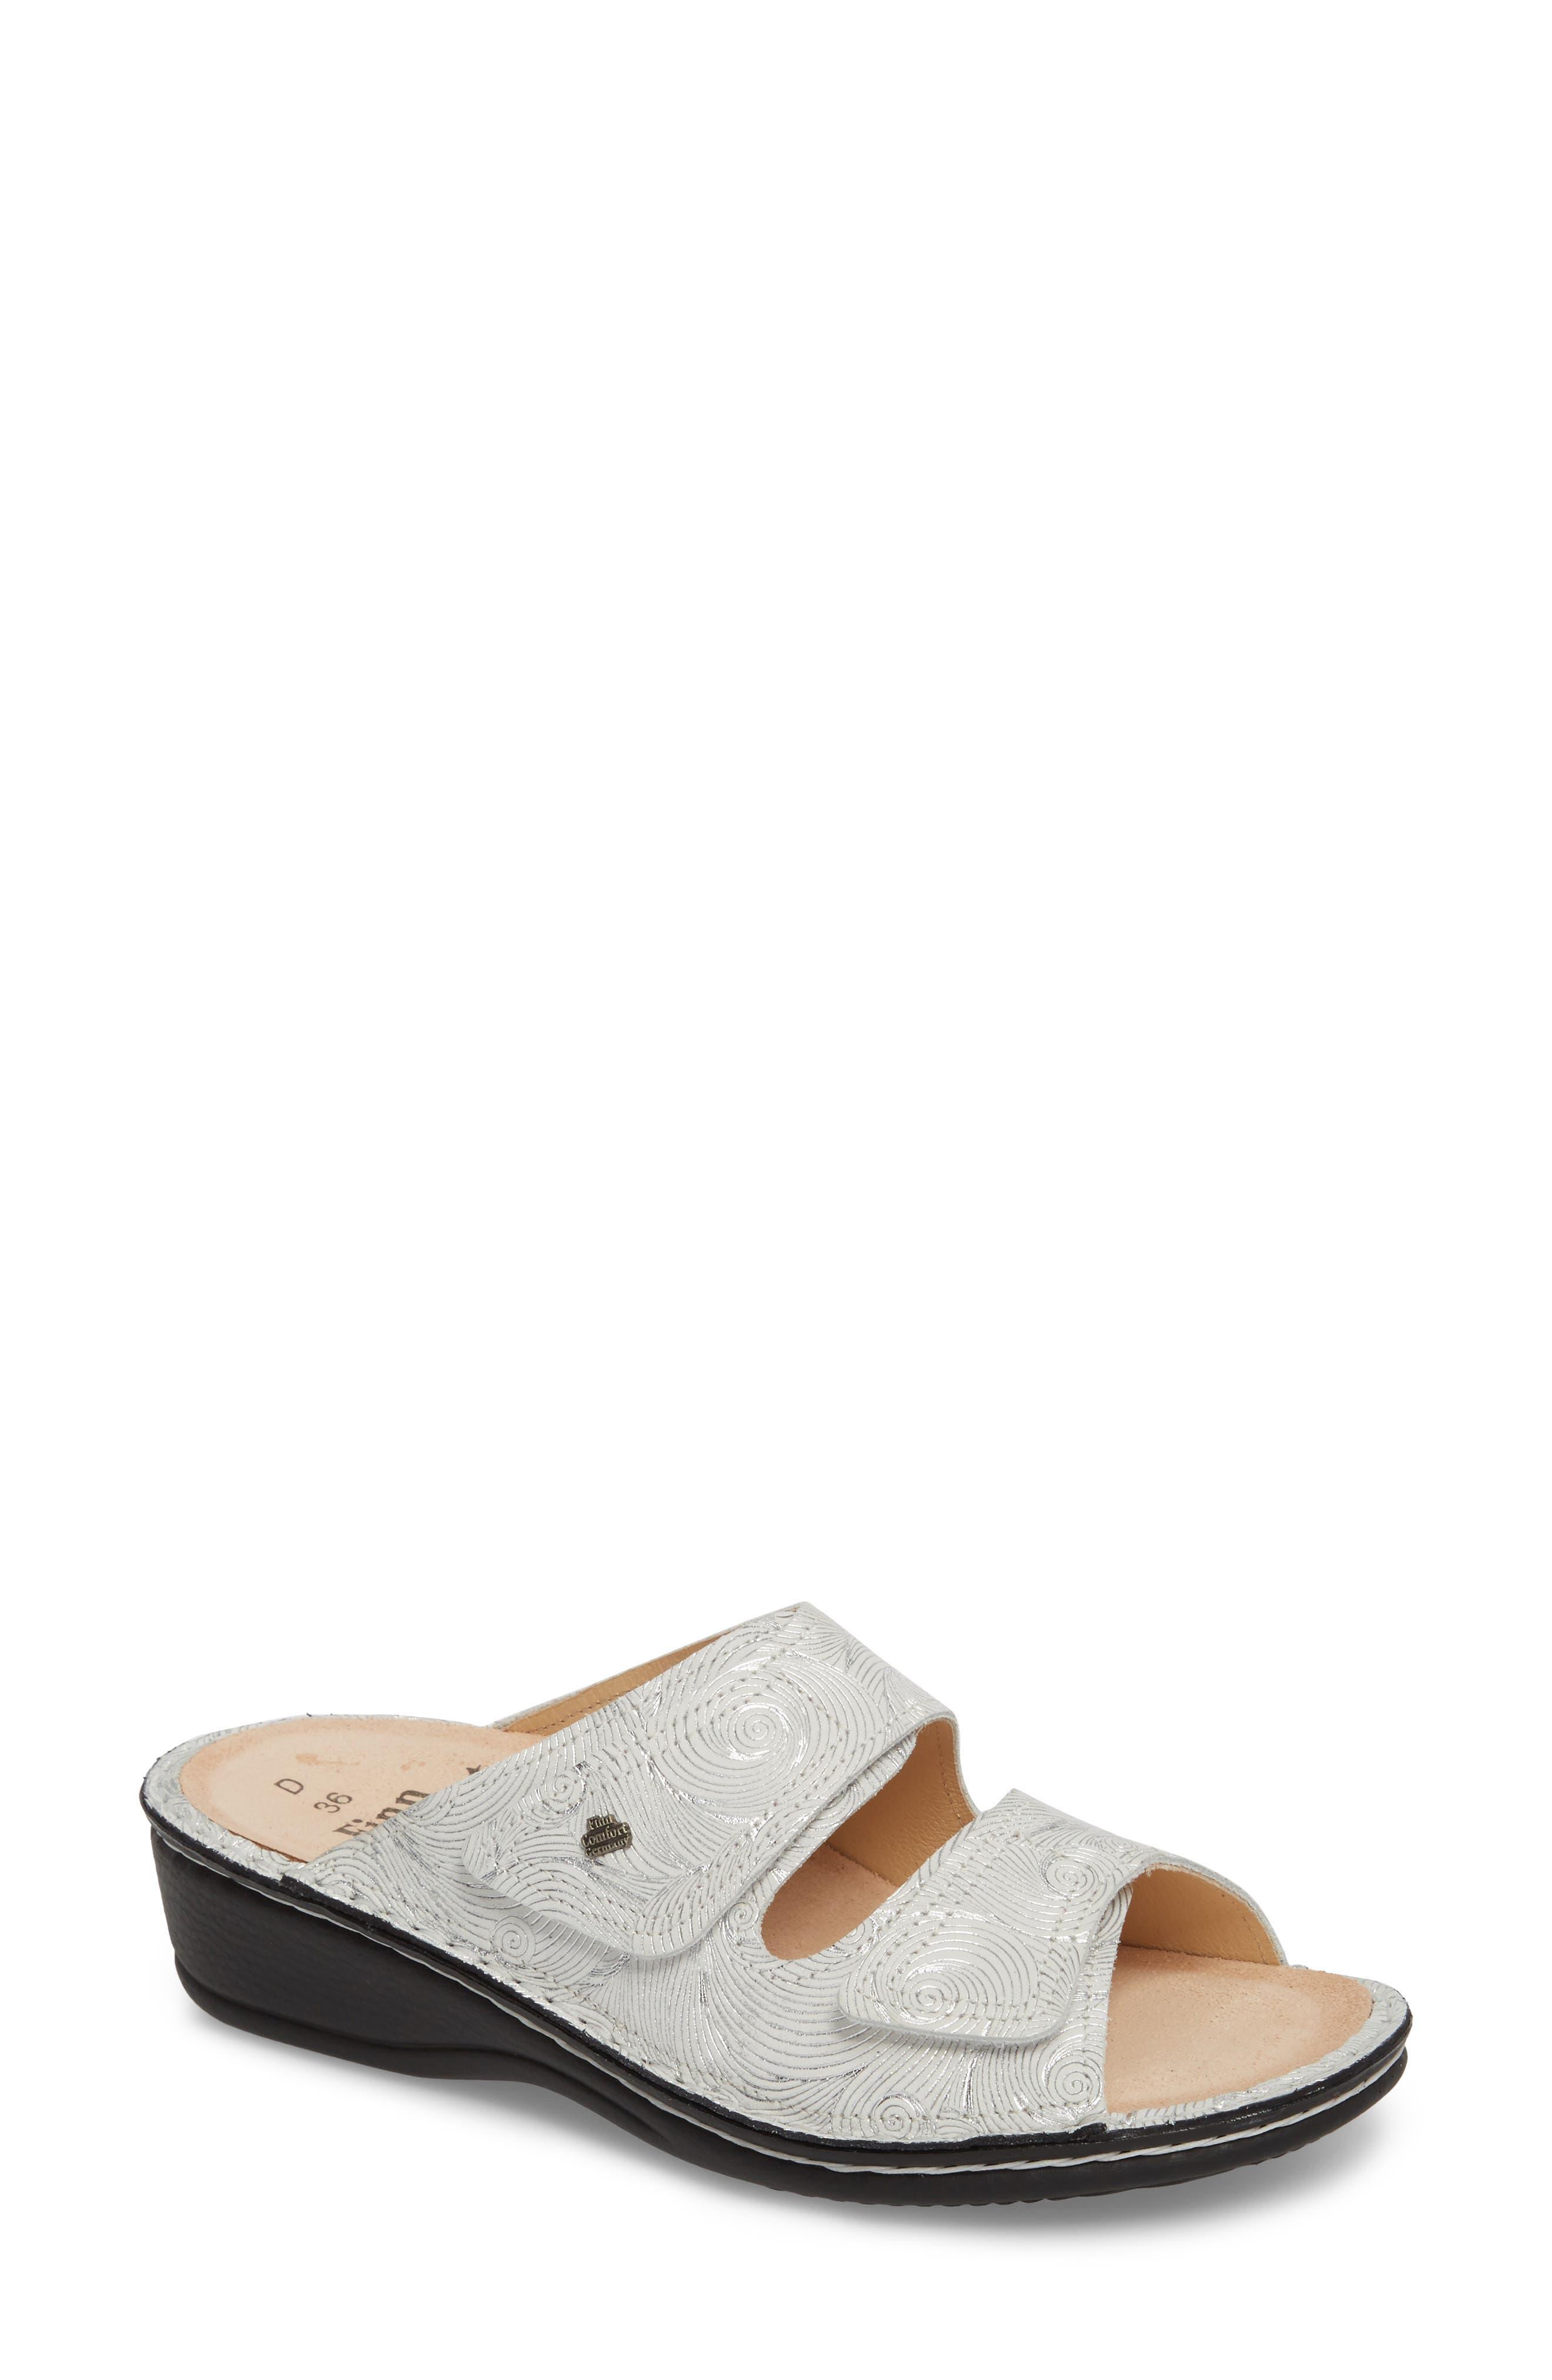 FINN COMFORT 'Jamaica' Sandal, Main, color, 100